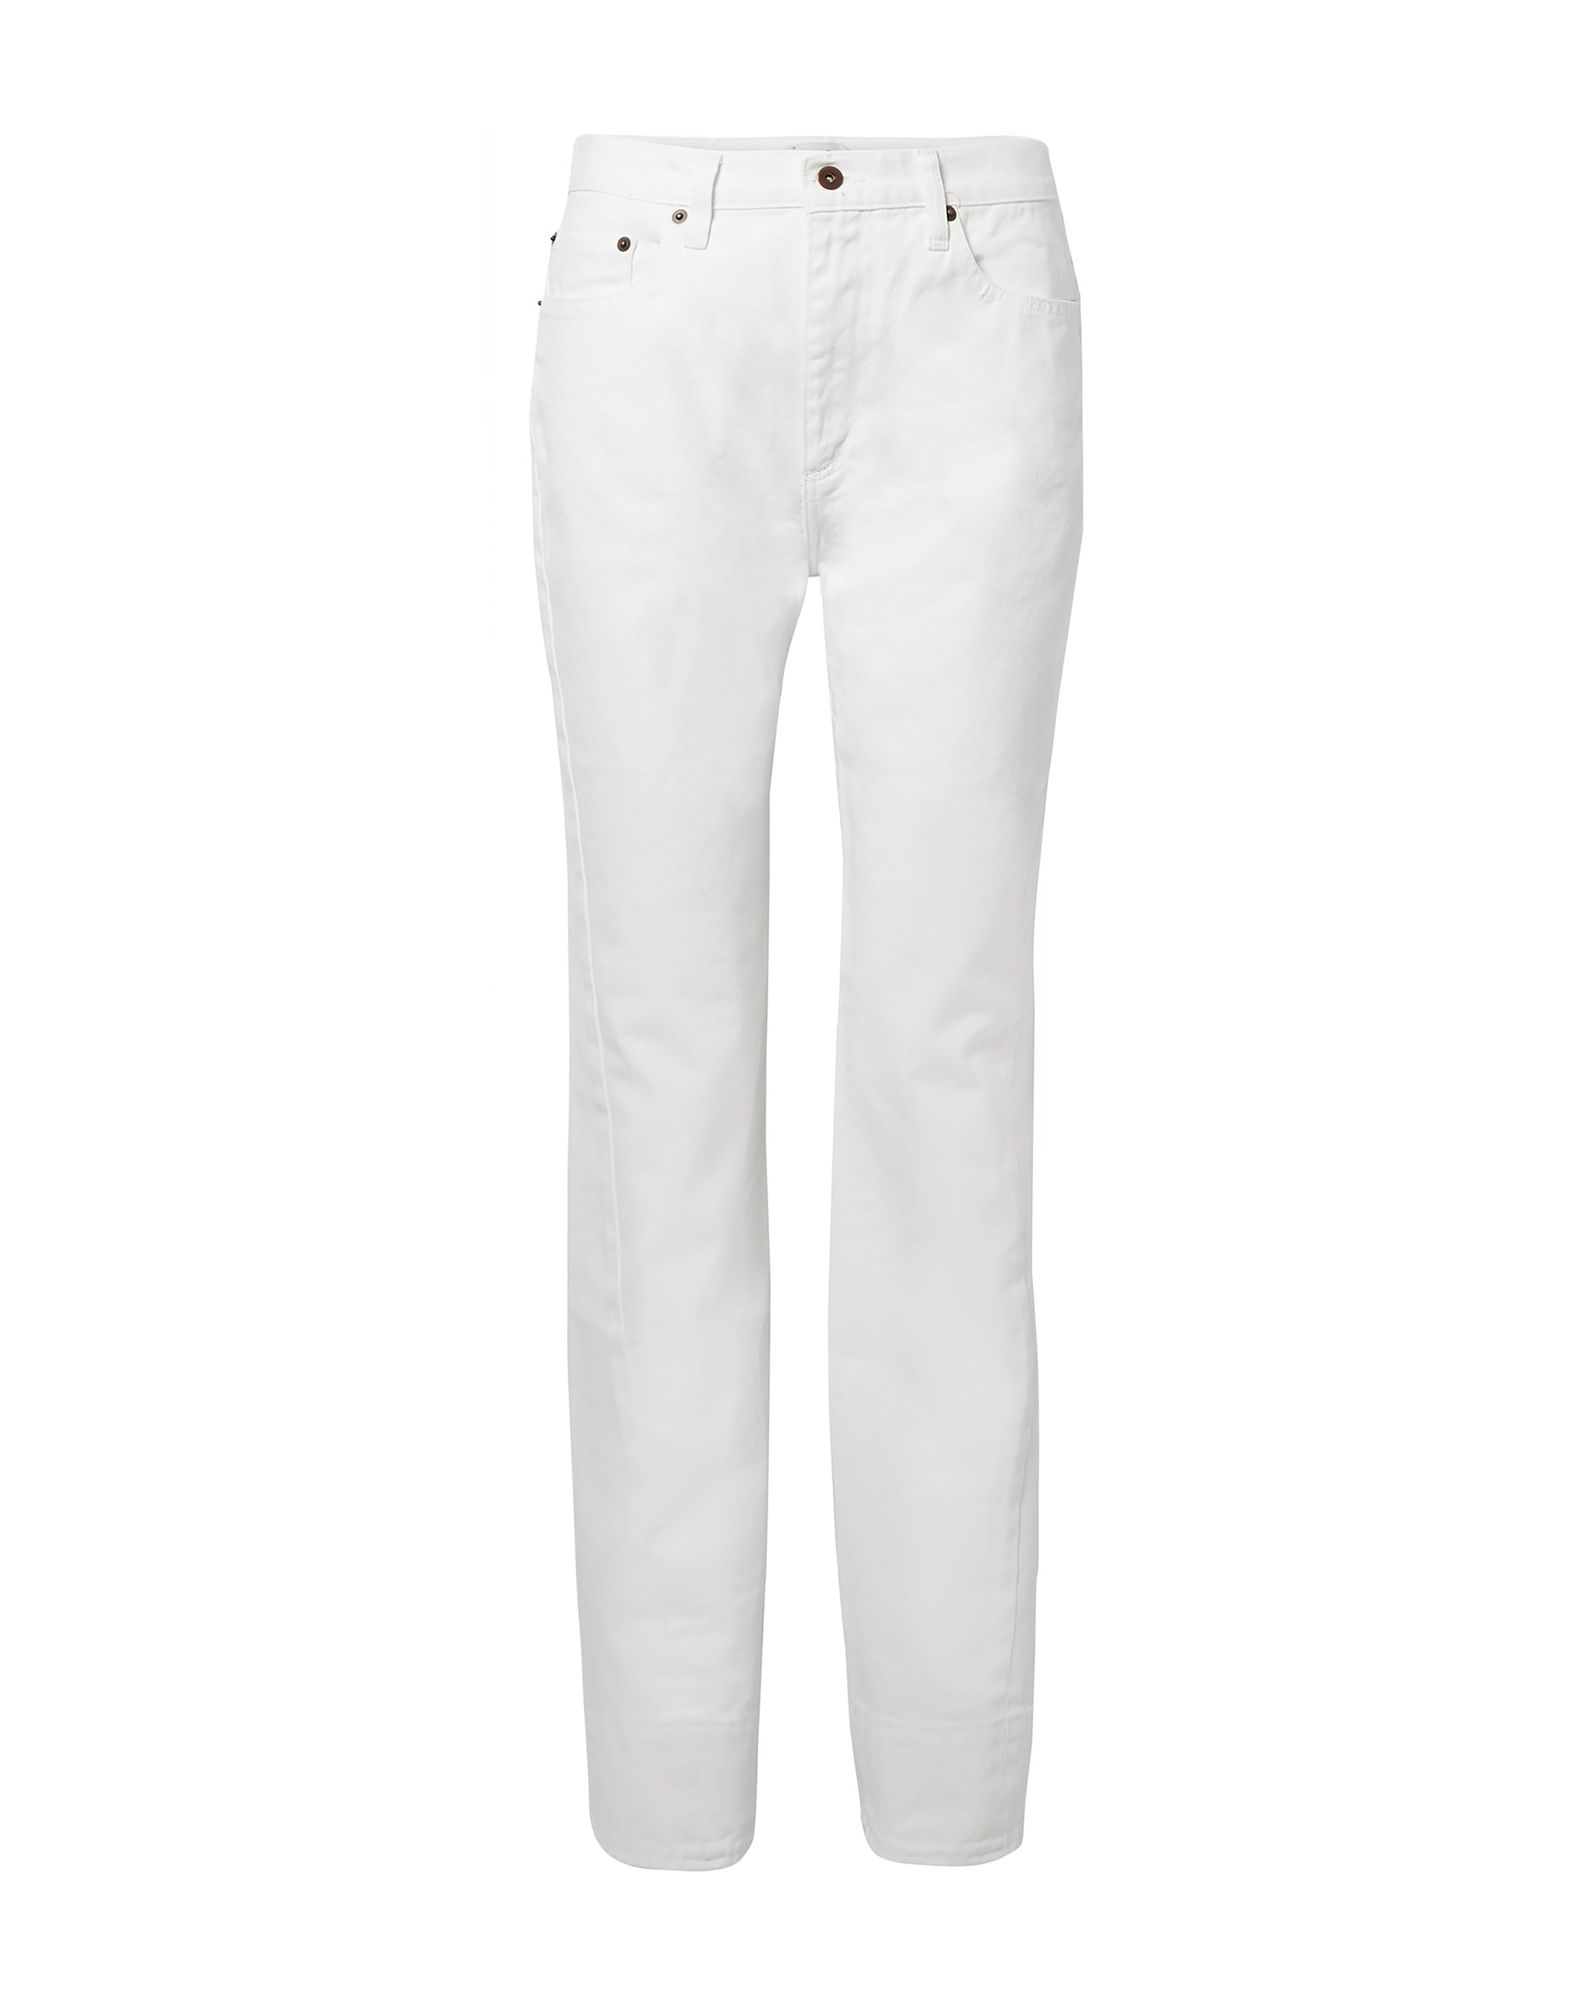 TRE Джинсовые брюки andrew mackenzie джинсовые брюки